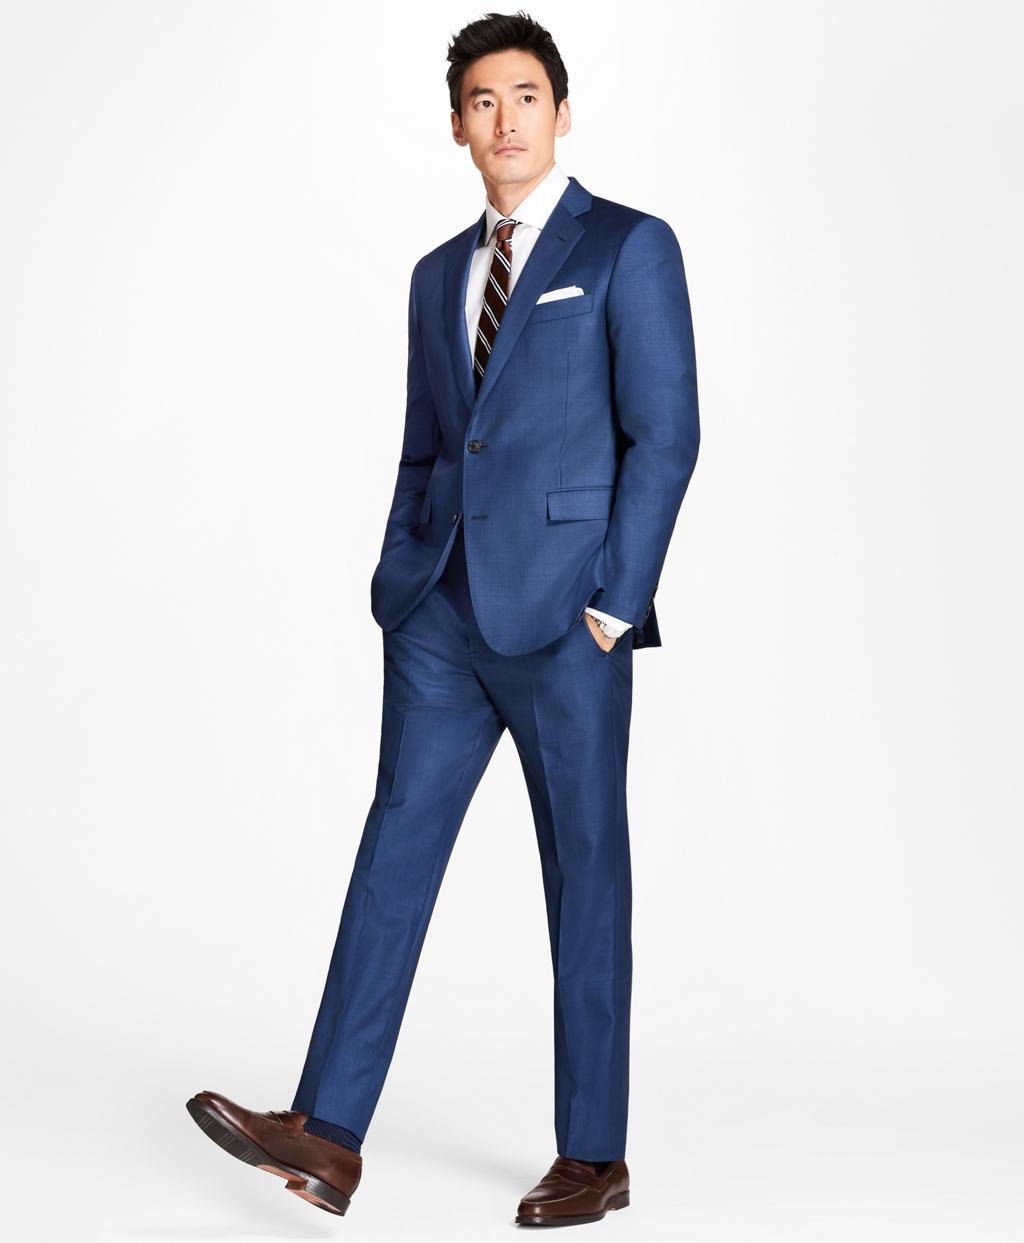 61765c4127e09c Regent Fit Sharkskin 1818 Suit - Brooks Brothers